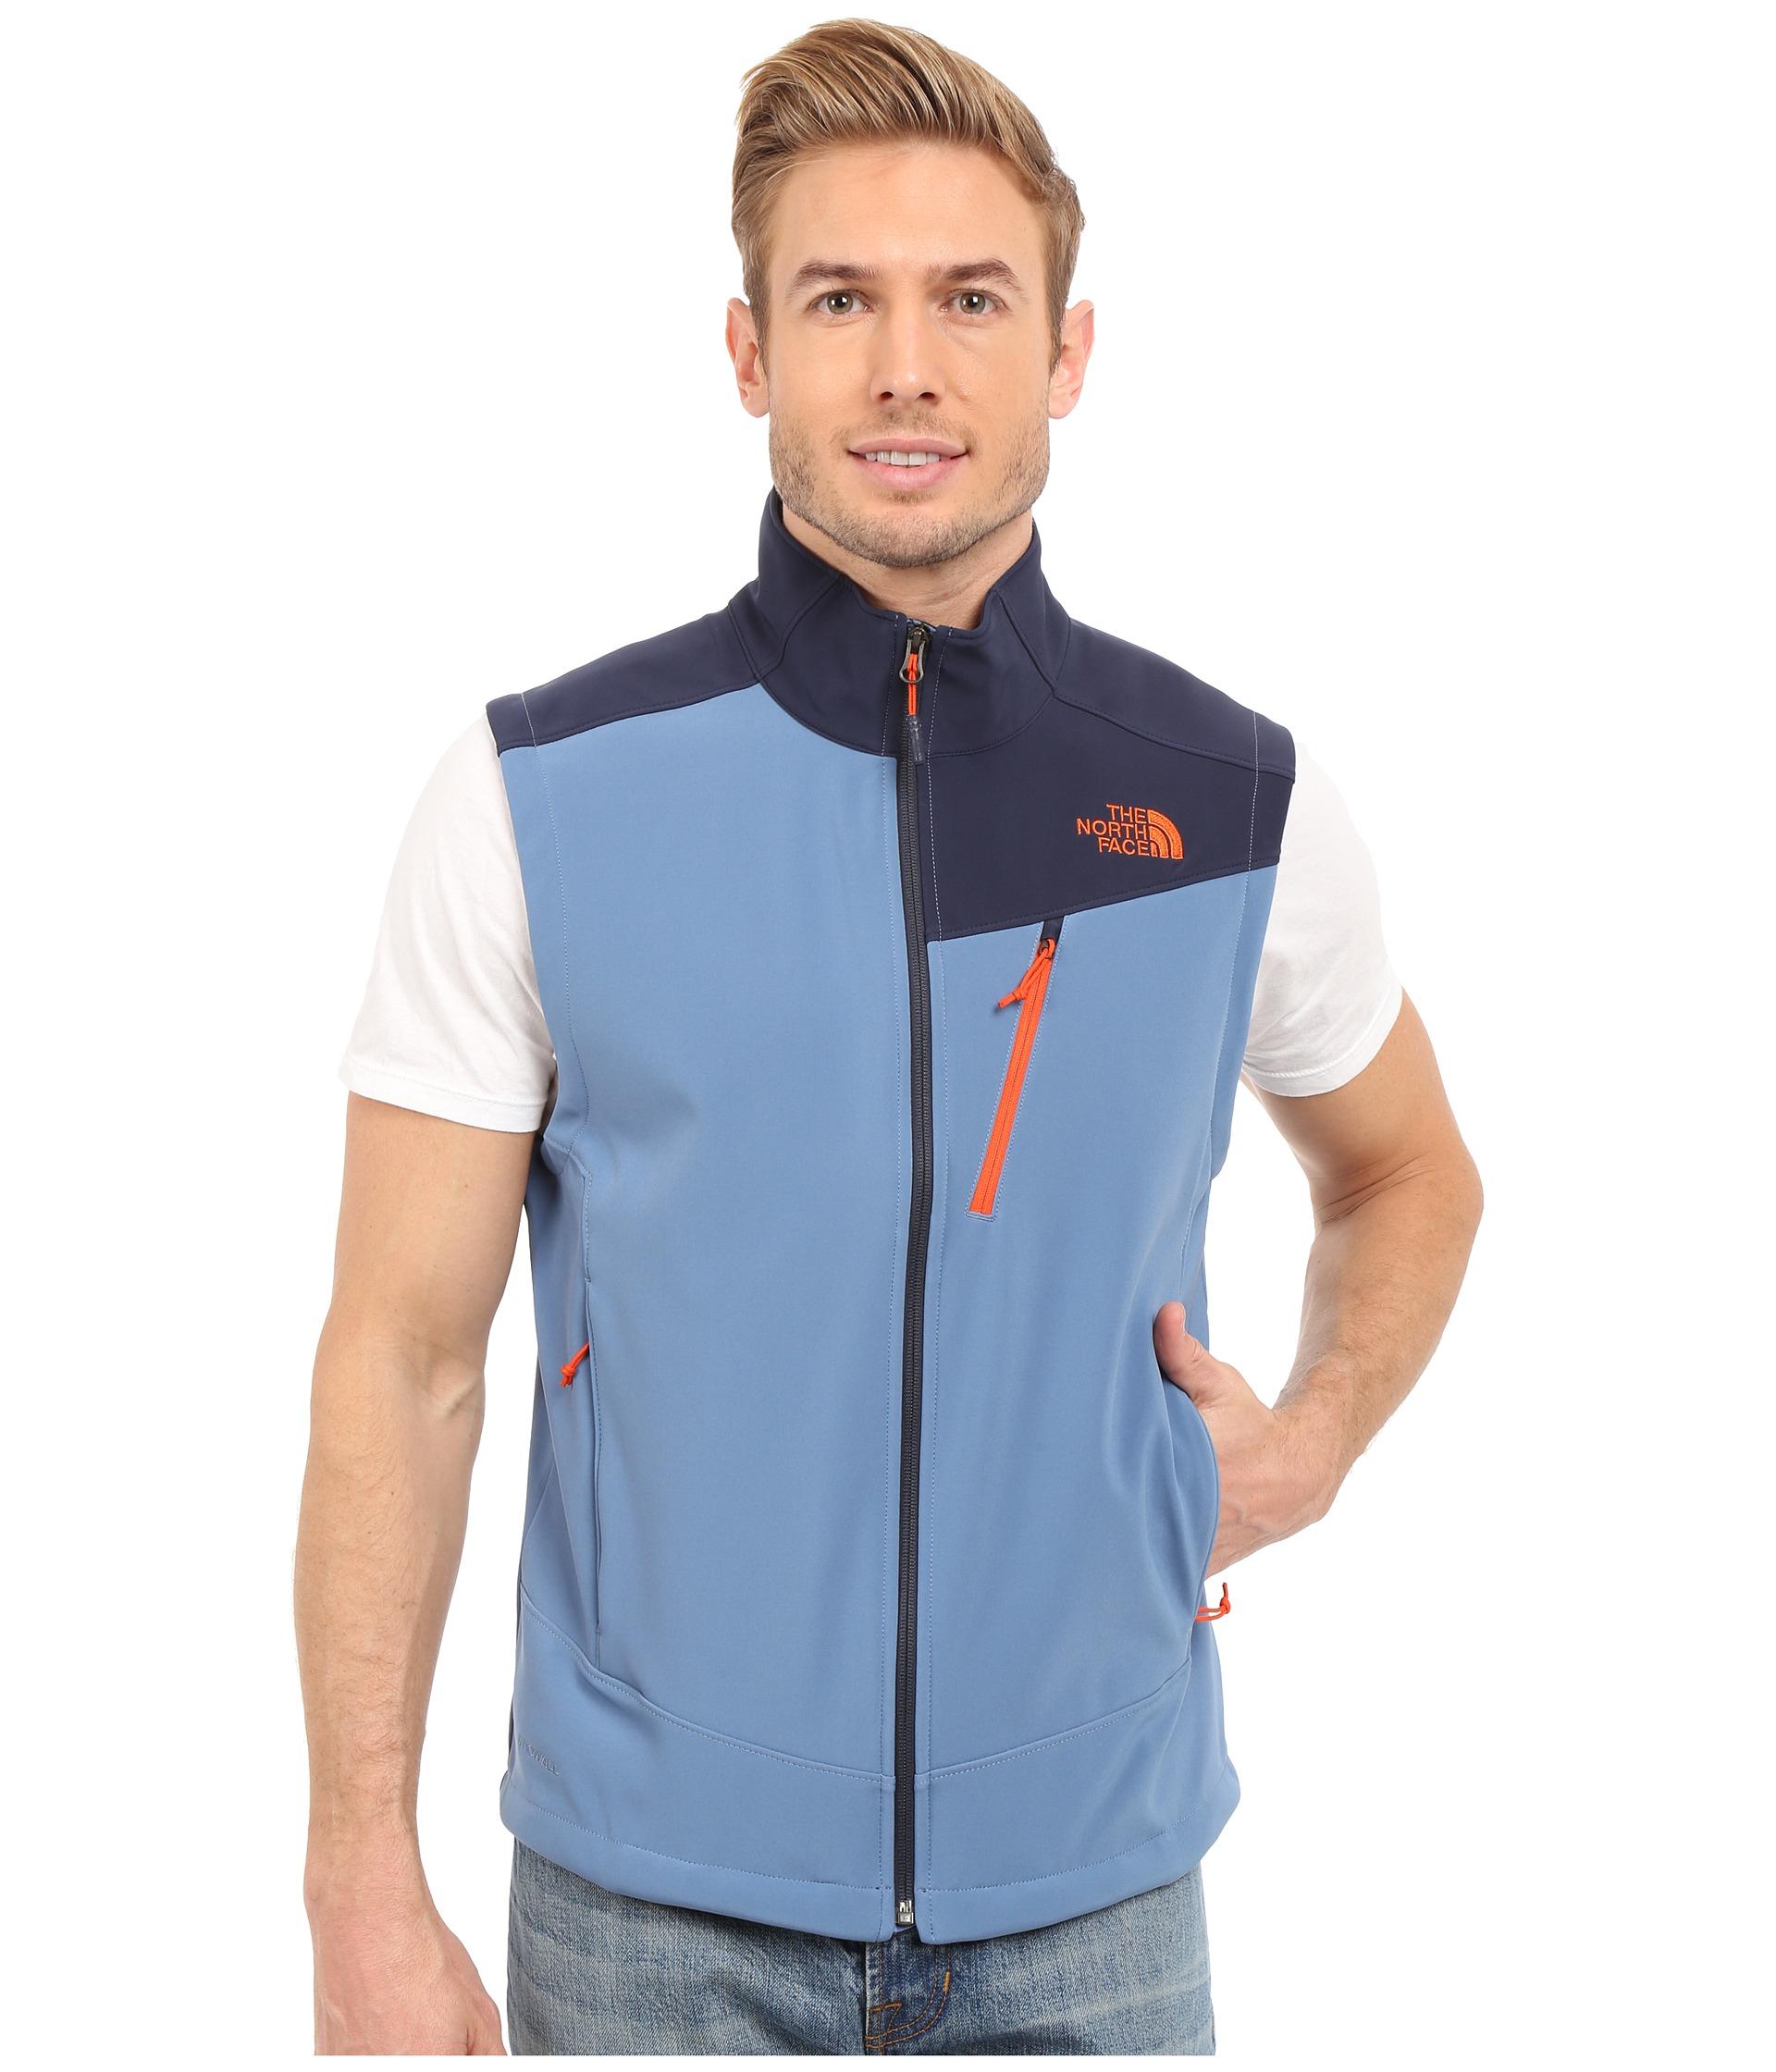 ccaf461d60e2 Lyst - The North Face Apex Shellrock Vest in Blue for Men